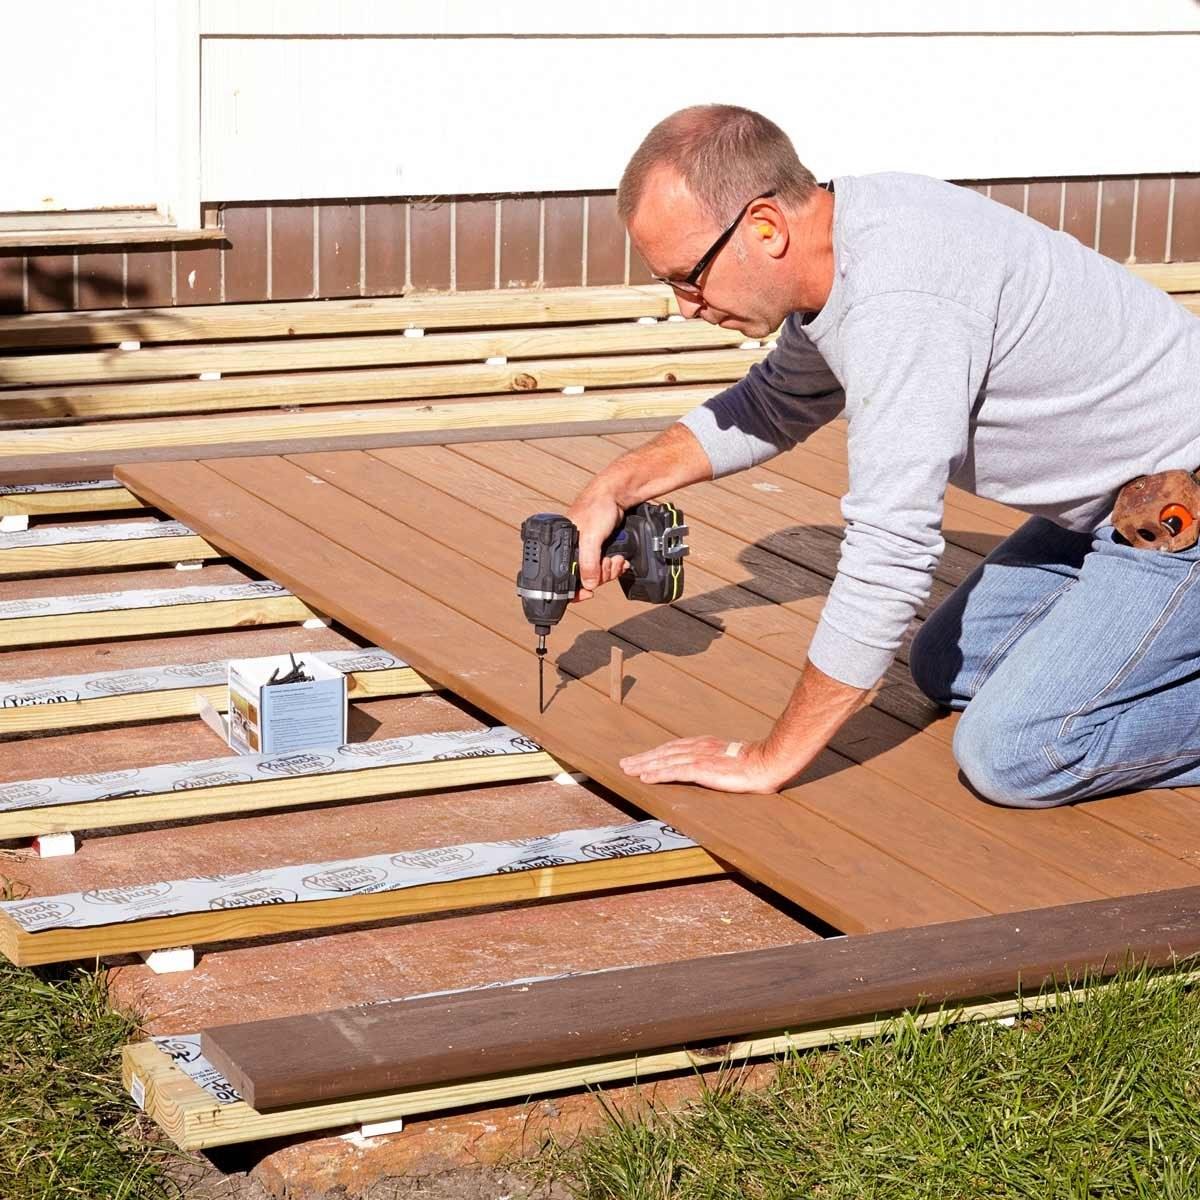 How To Build A Deck Over A Concrete Patio | Wood Deck Over Concrete Steps | Extension | Front | Back Deck | Cover Concrete | Solid Deck